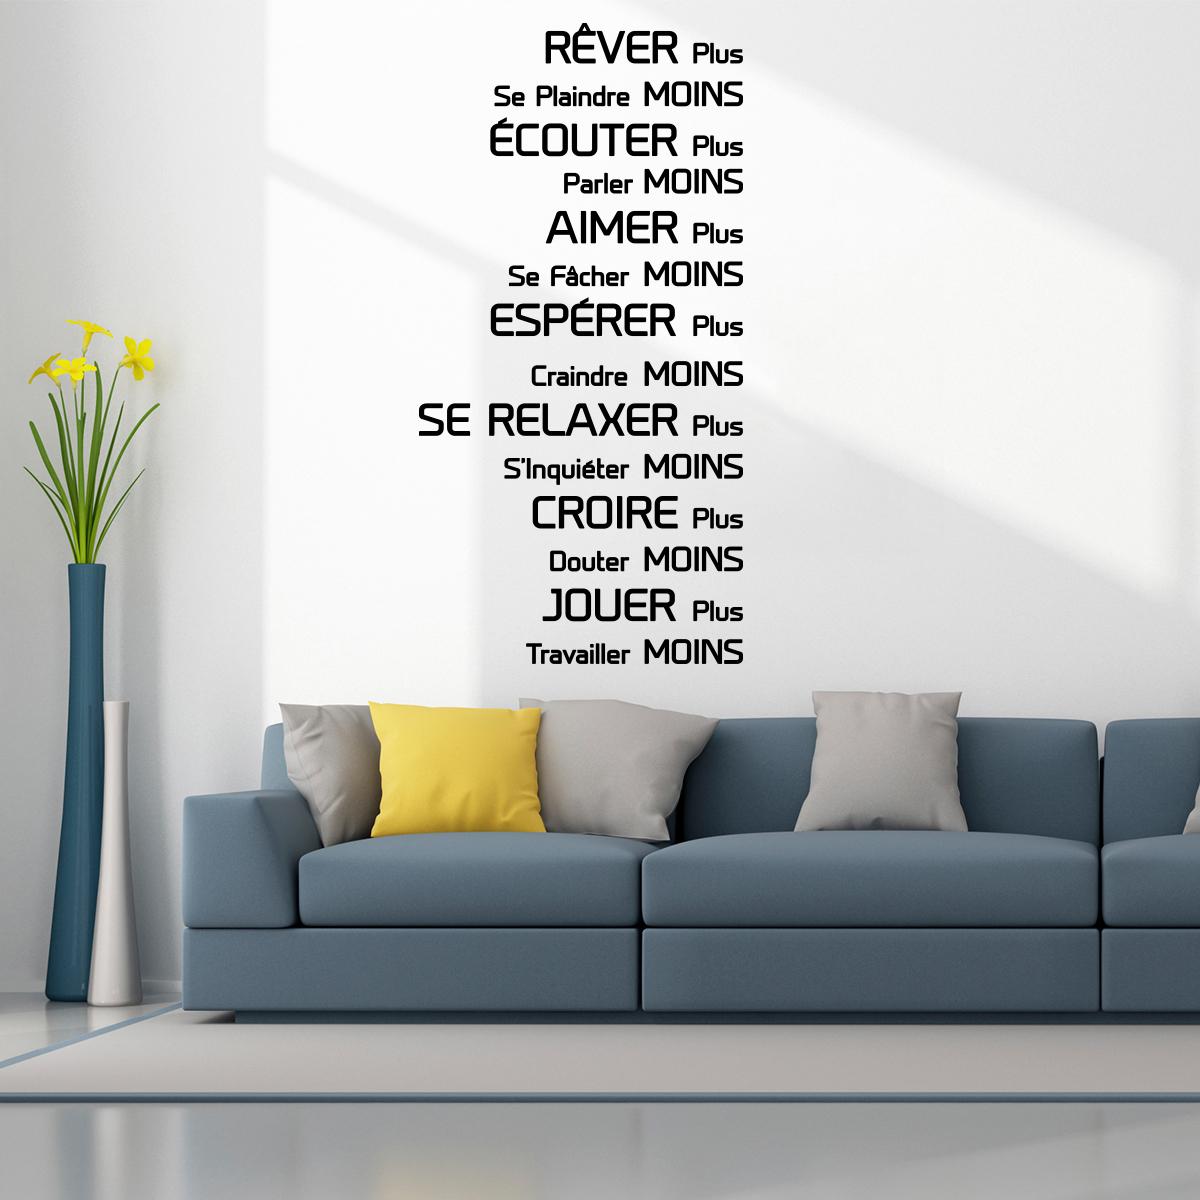 sticker citation r ver couter aimer esp rer stickers citations fran ais ambiance sticker. Black Bedroom Furniture Sets. Home Design Ideas